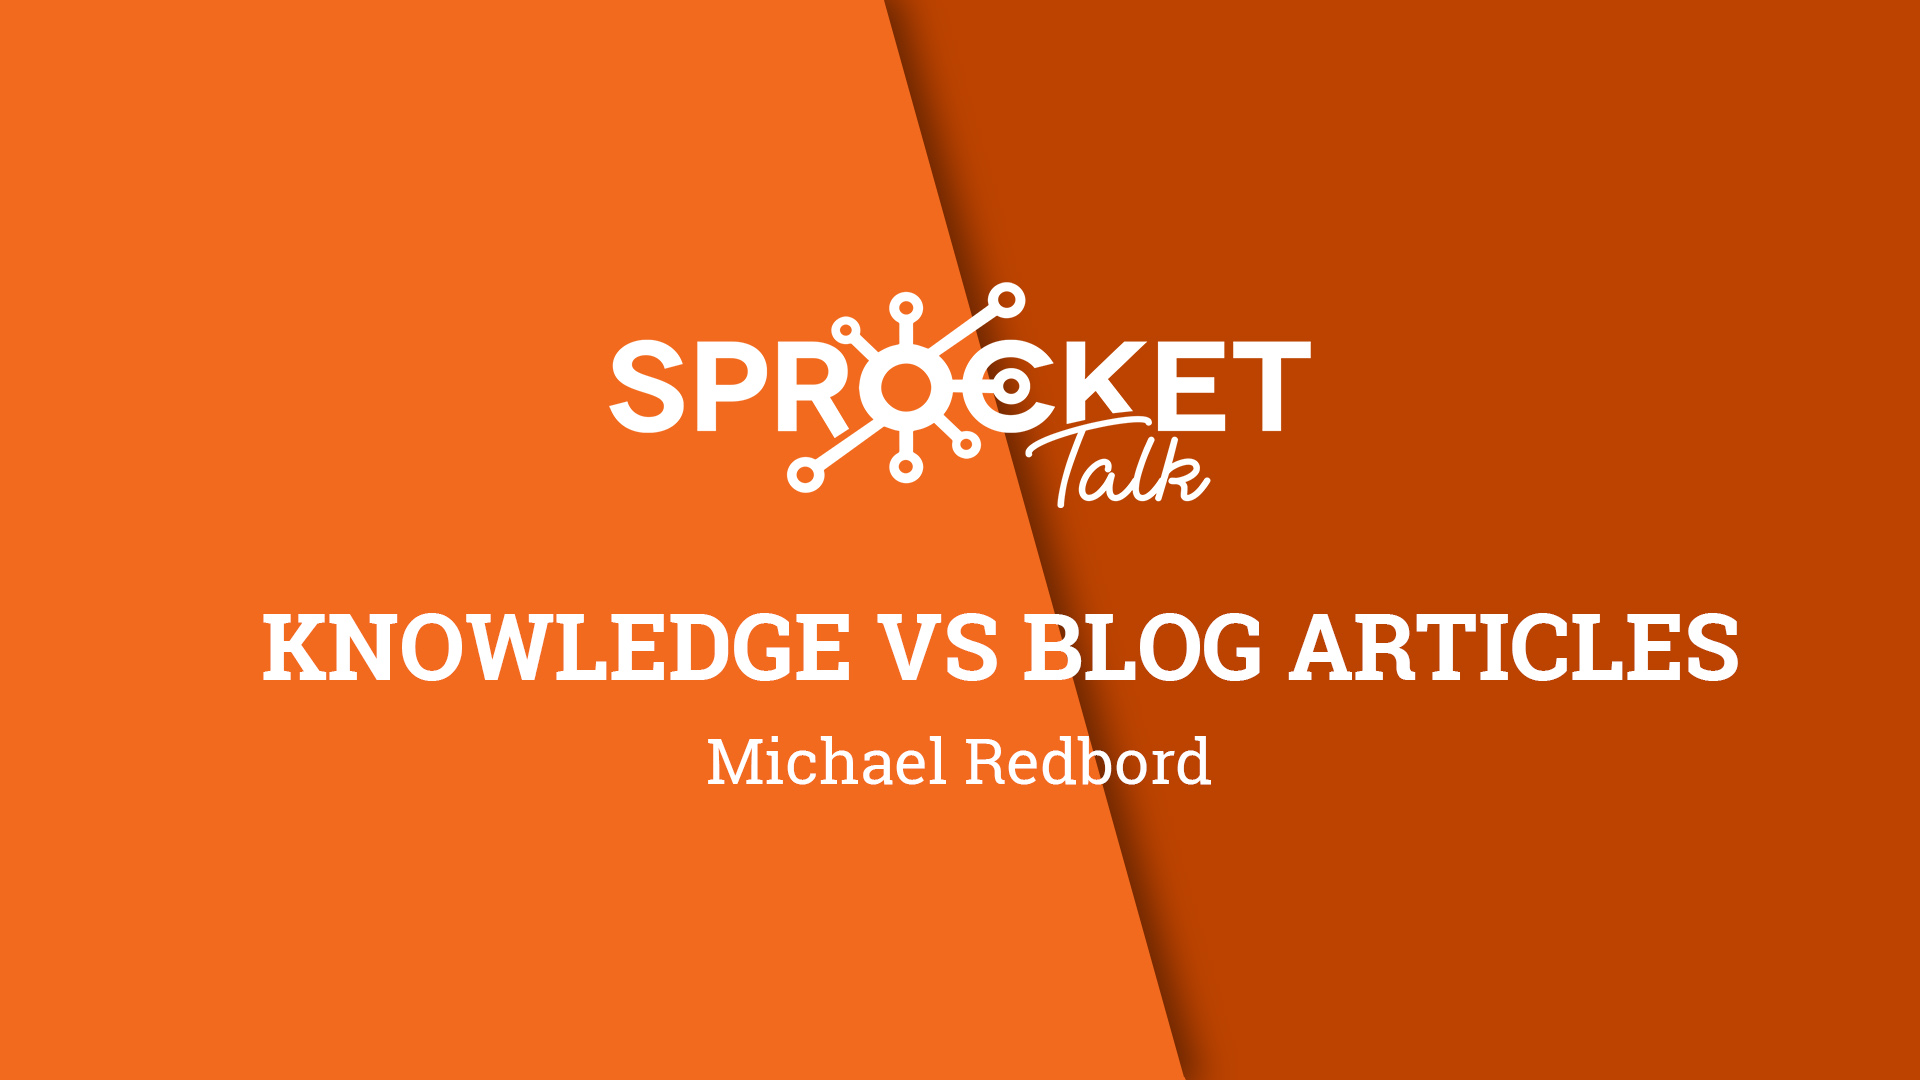 Michael Redbord | Knowledge vs Blog